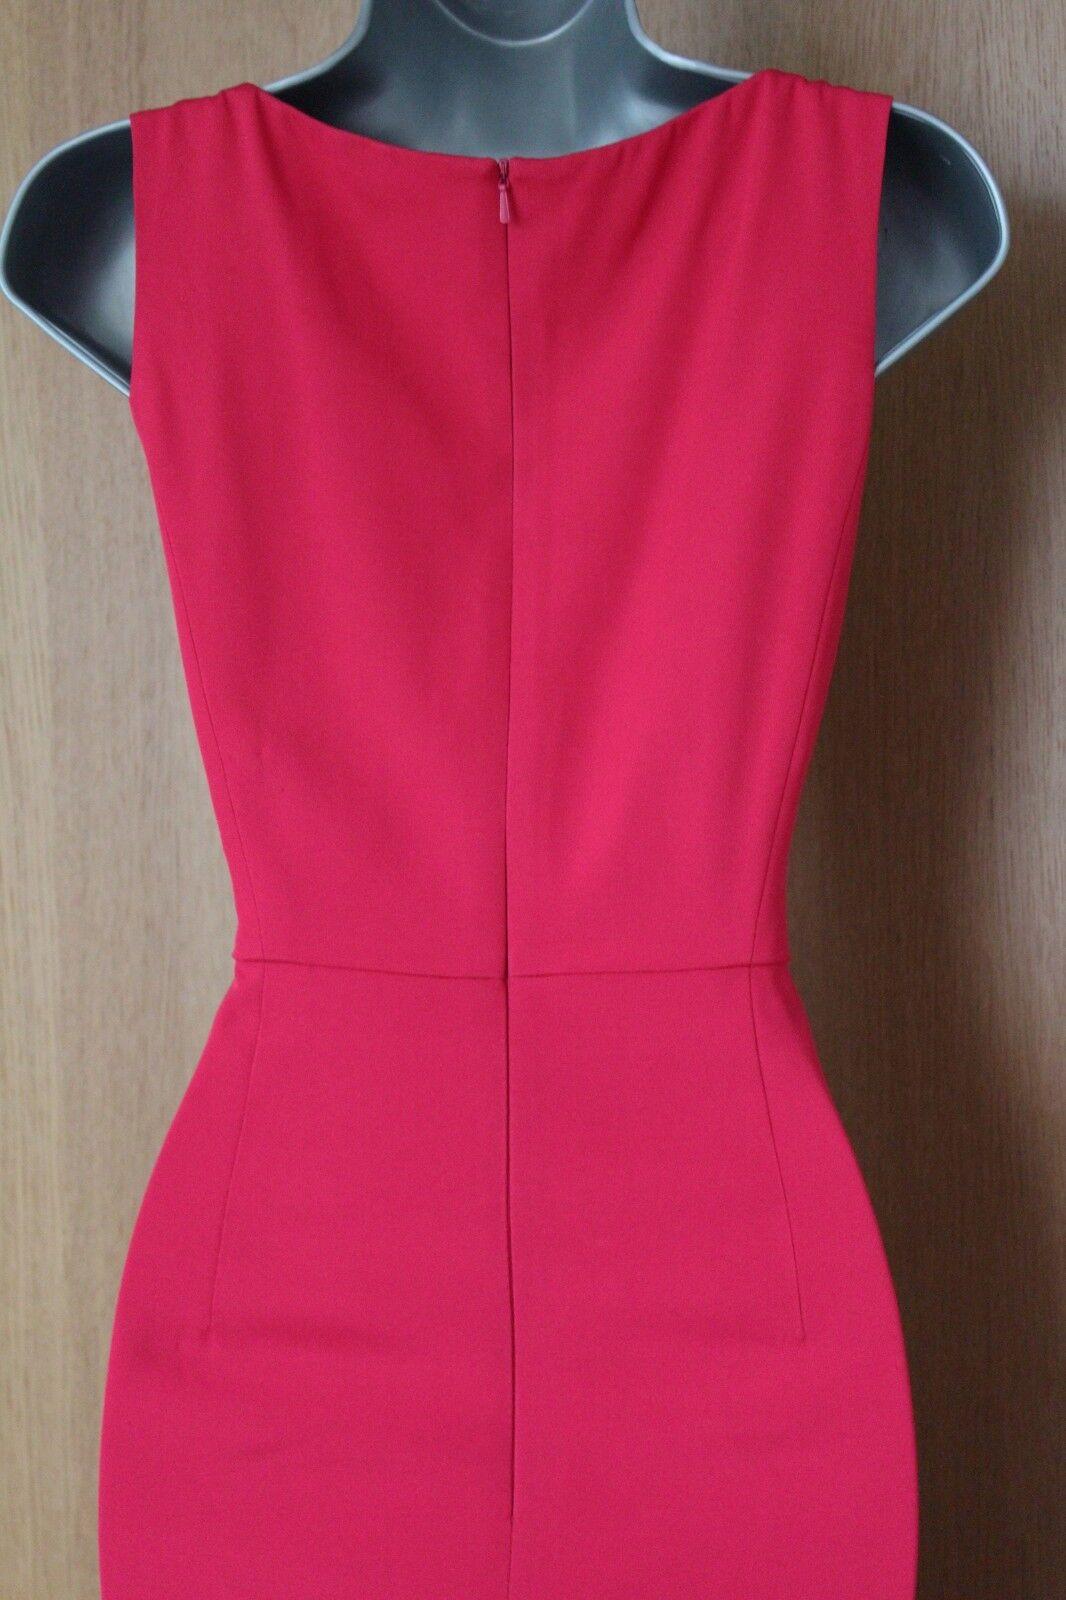 COAST Stunning Hot Pink Darcia Darcia Darcia May Bow Shift Dress Formal Party 59288e